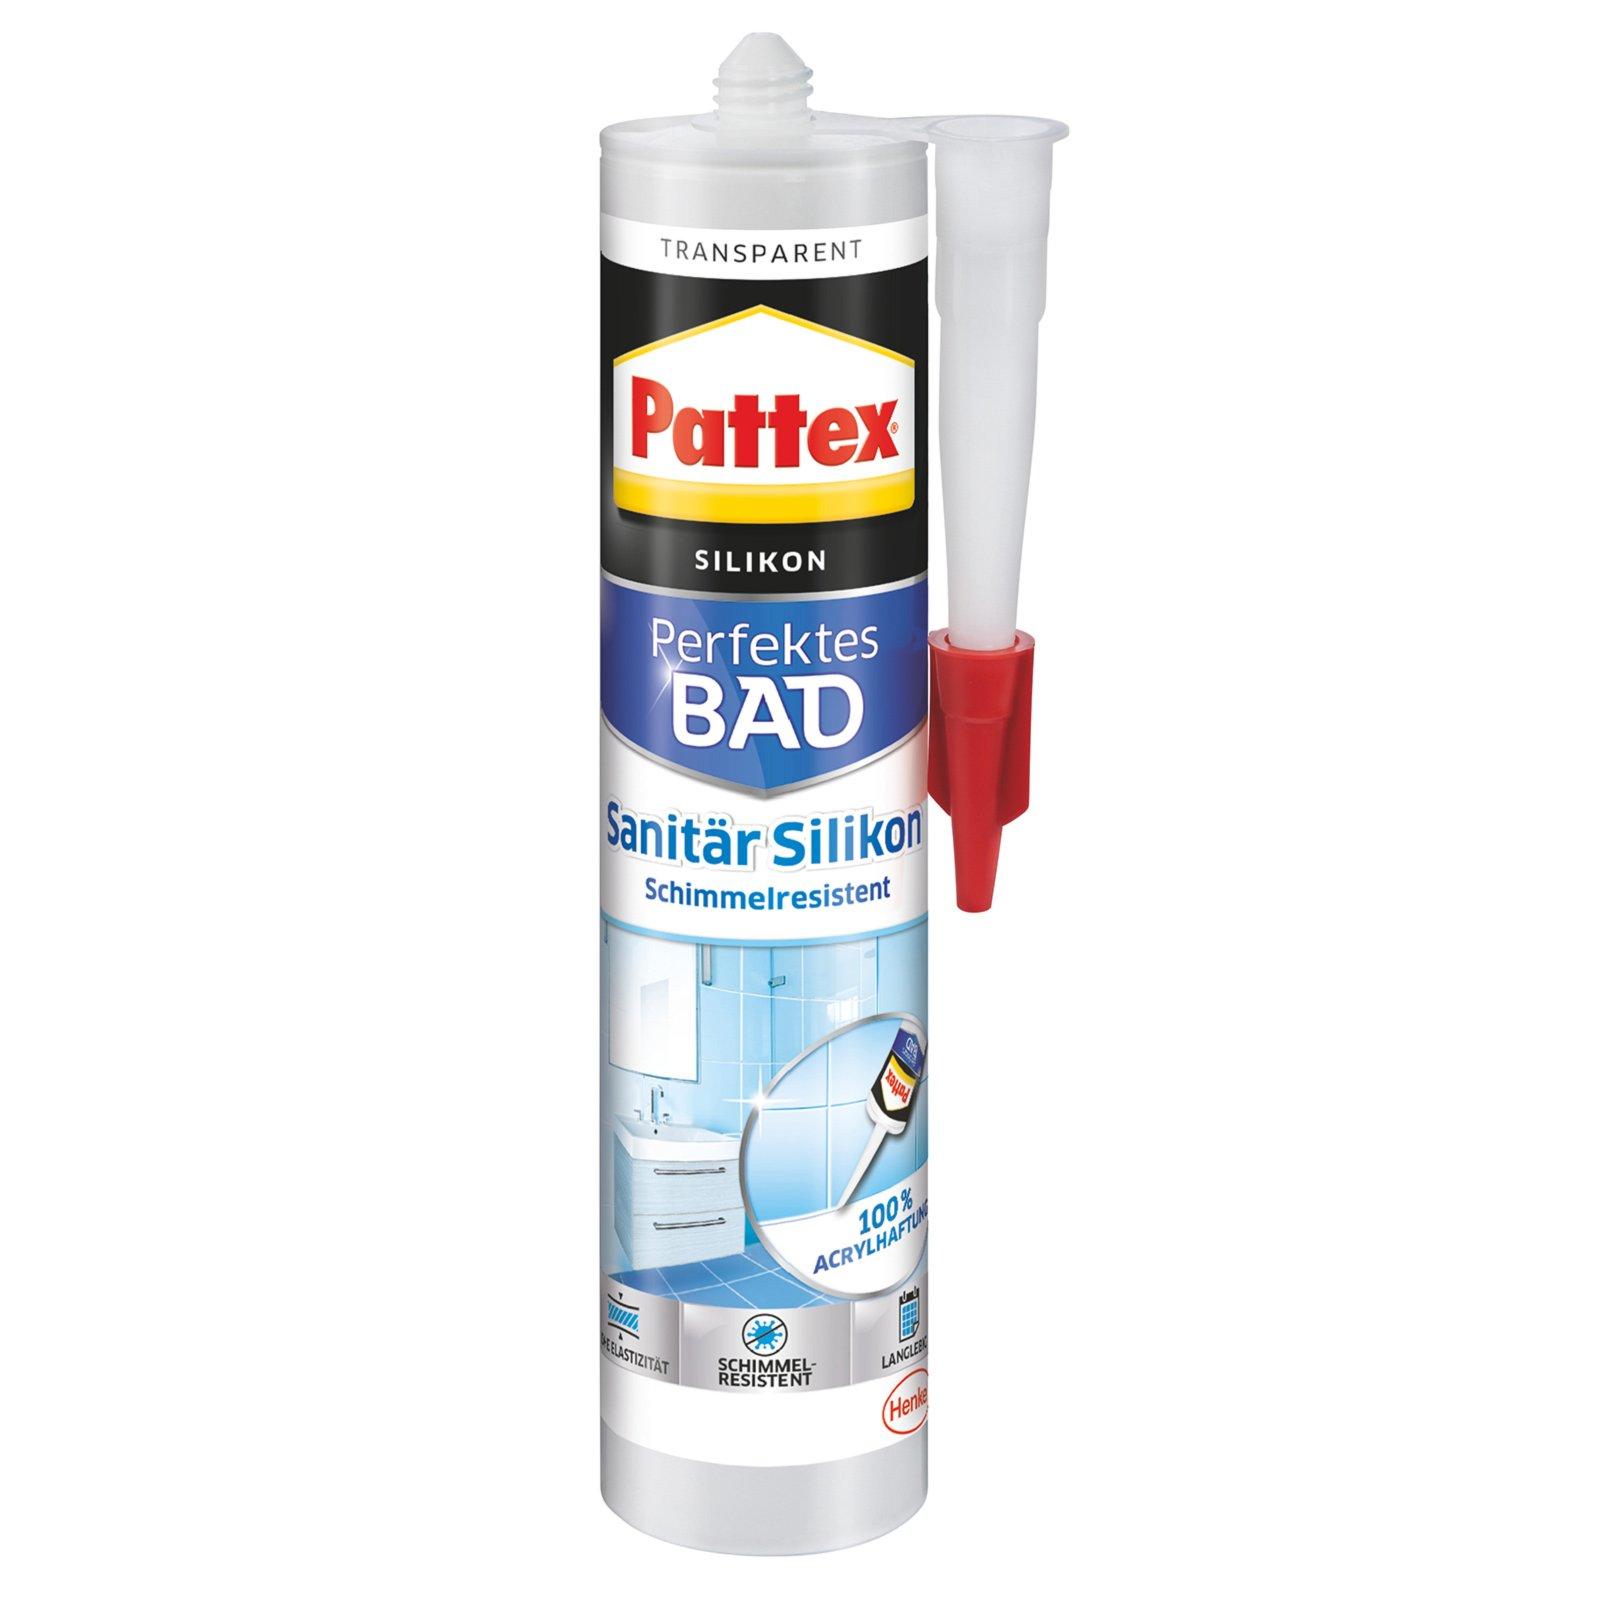 Pattex Sanitär Silikon - transparent - 310 g